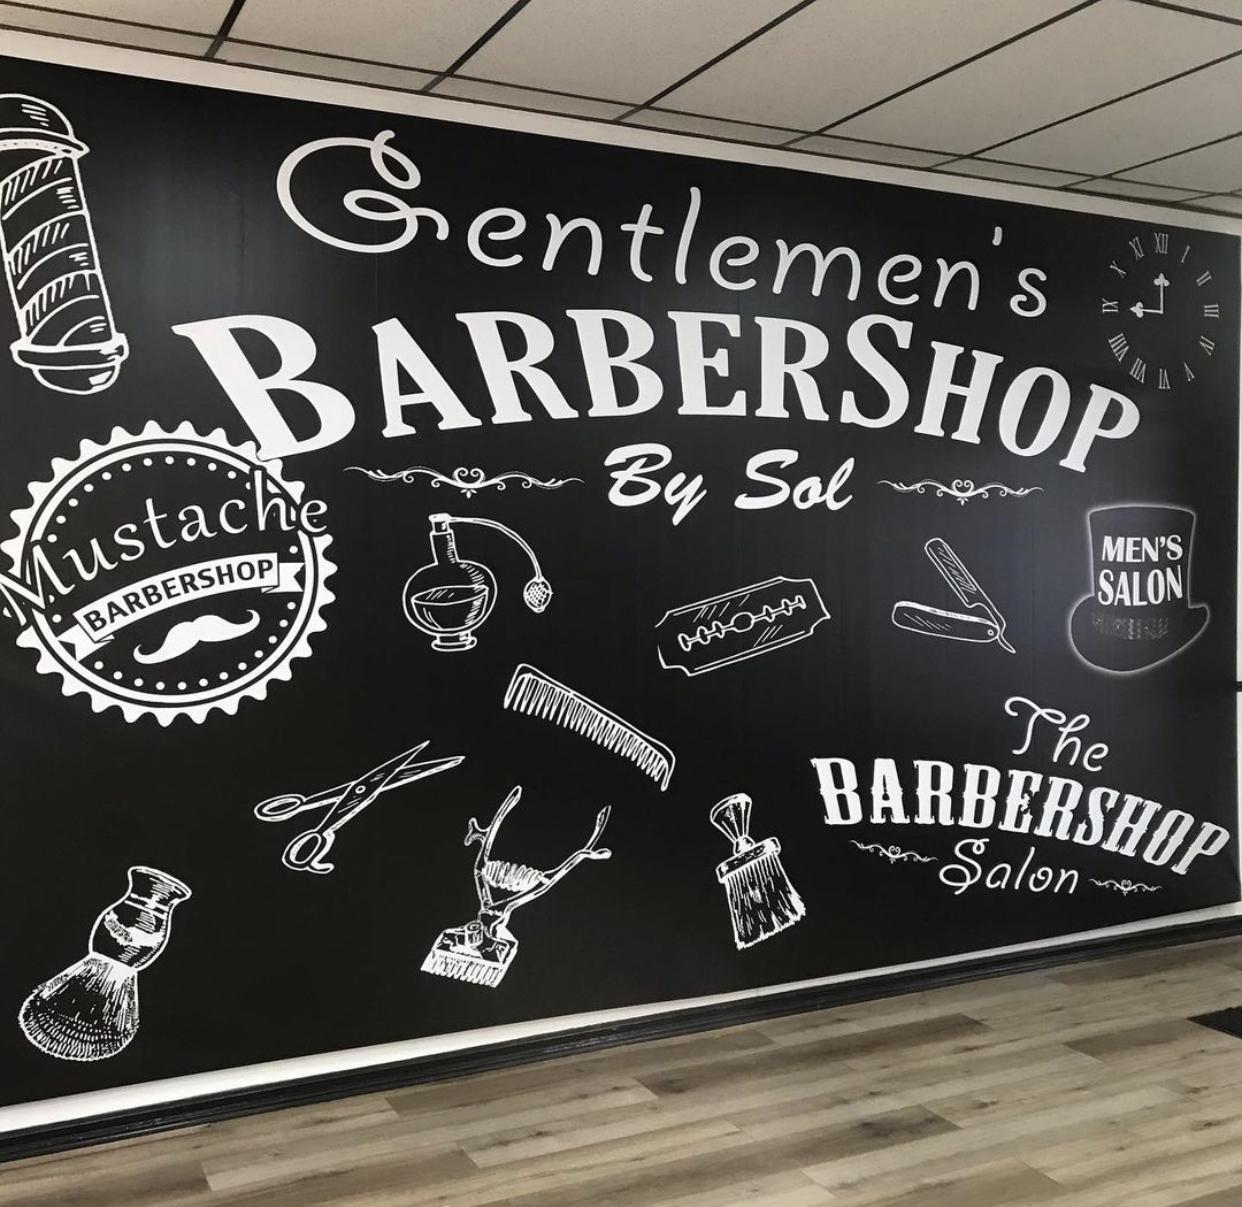 "Gentlemen's Barbershop By Sol 7750 Palm Ave Suit ""M, Highland"